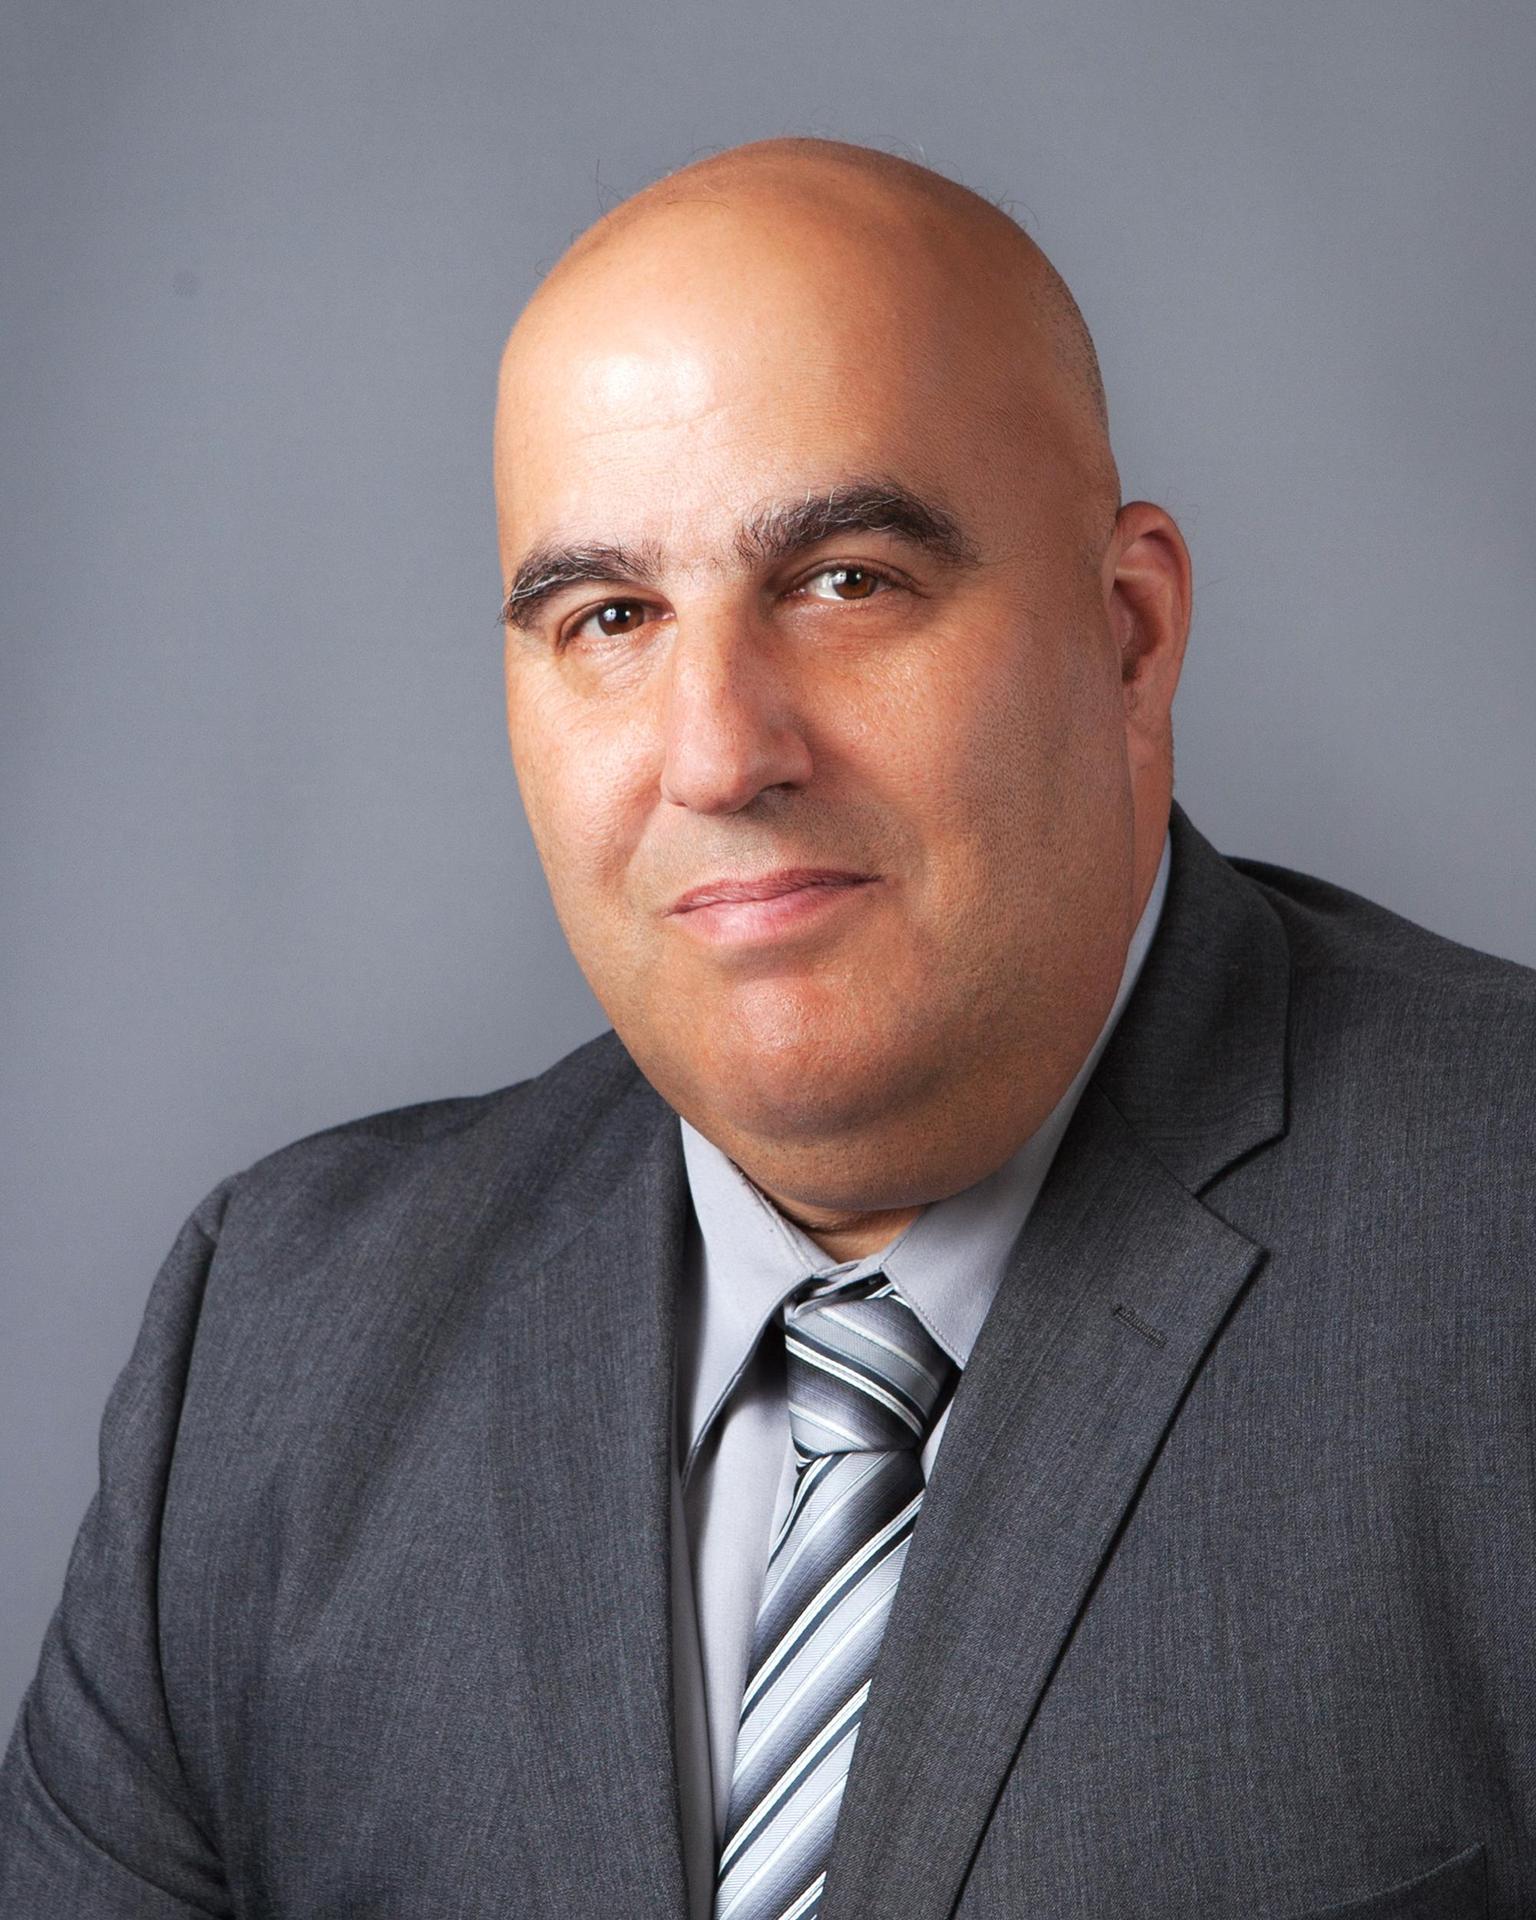 Vice Principal John Sutera